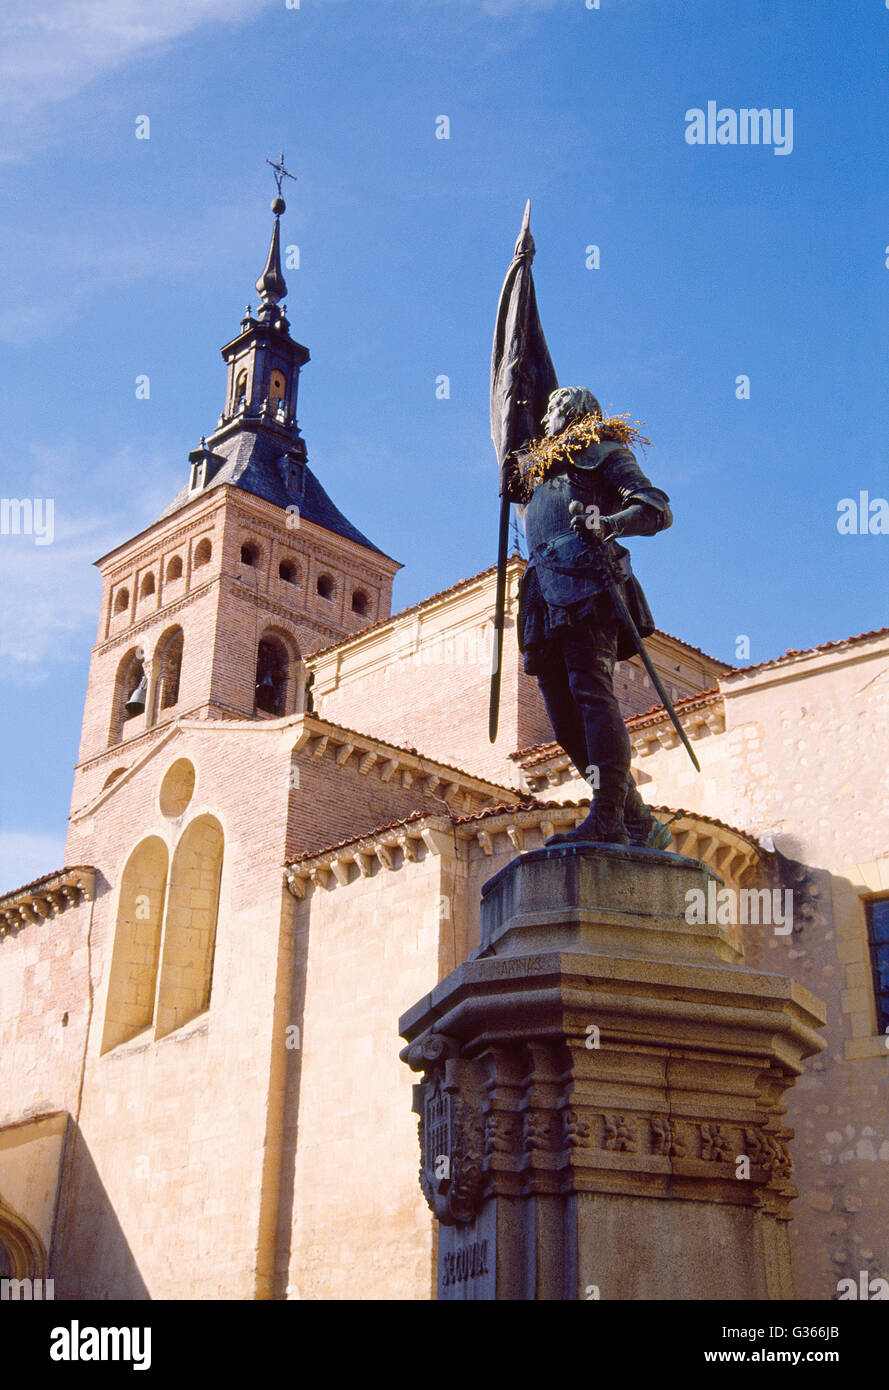 Juan Bravo monument and San Martin church. Segovia, Spain. - Stock Image